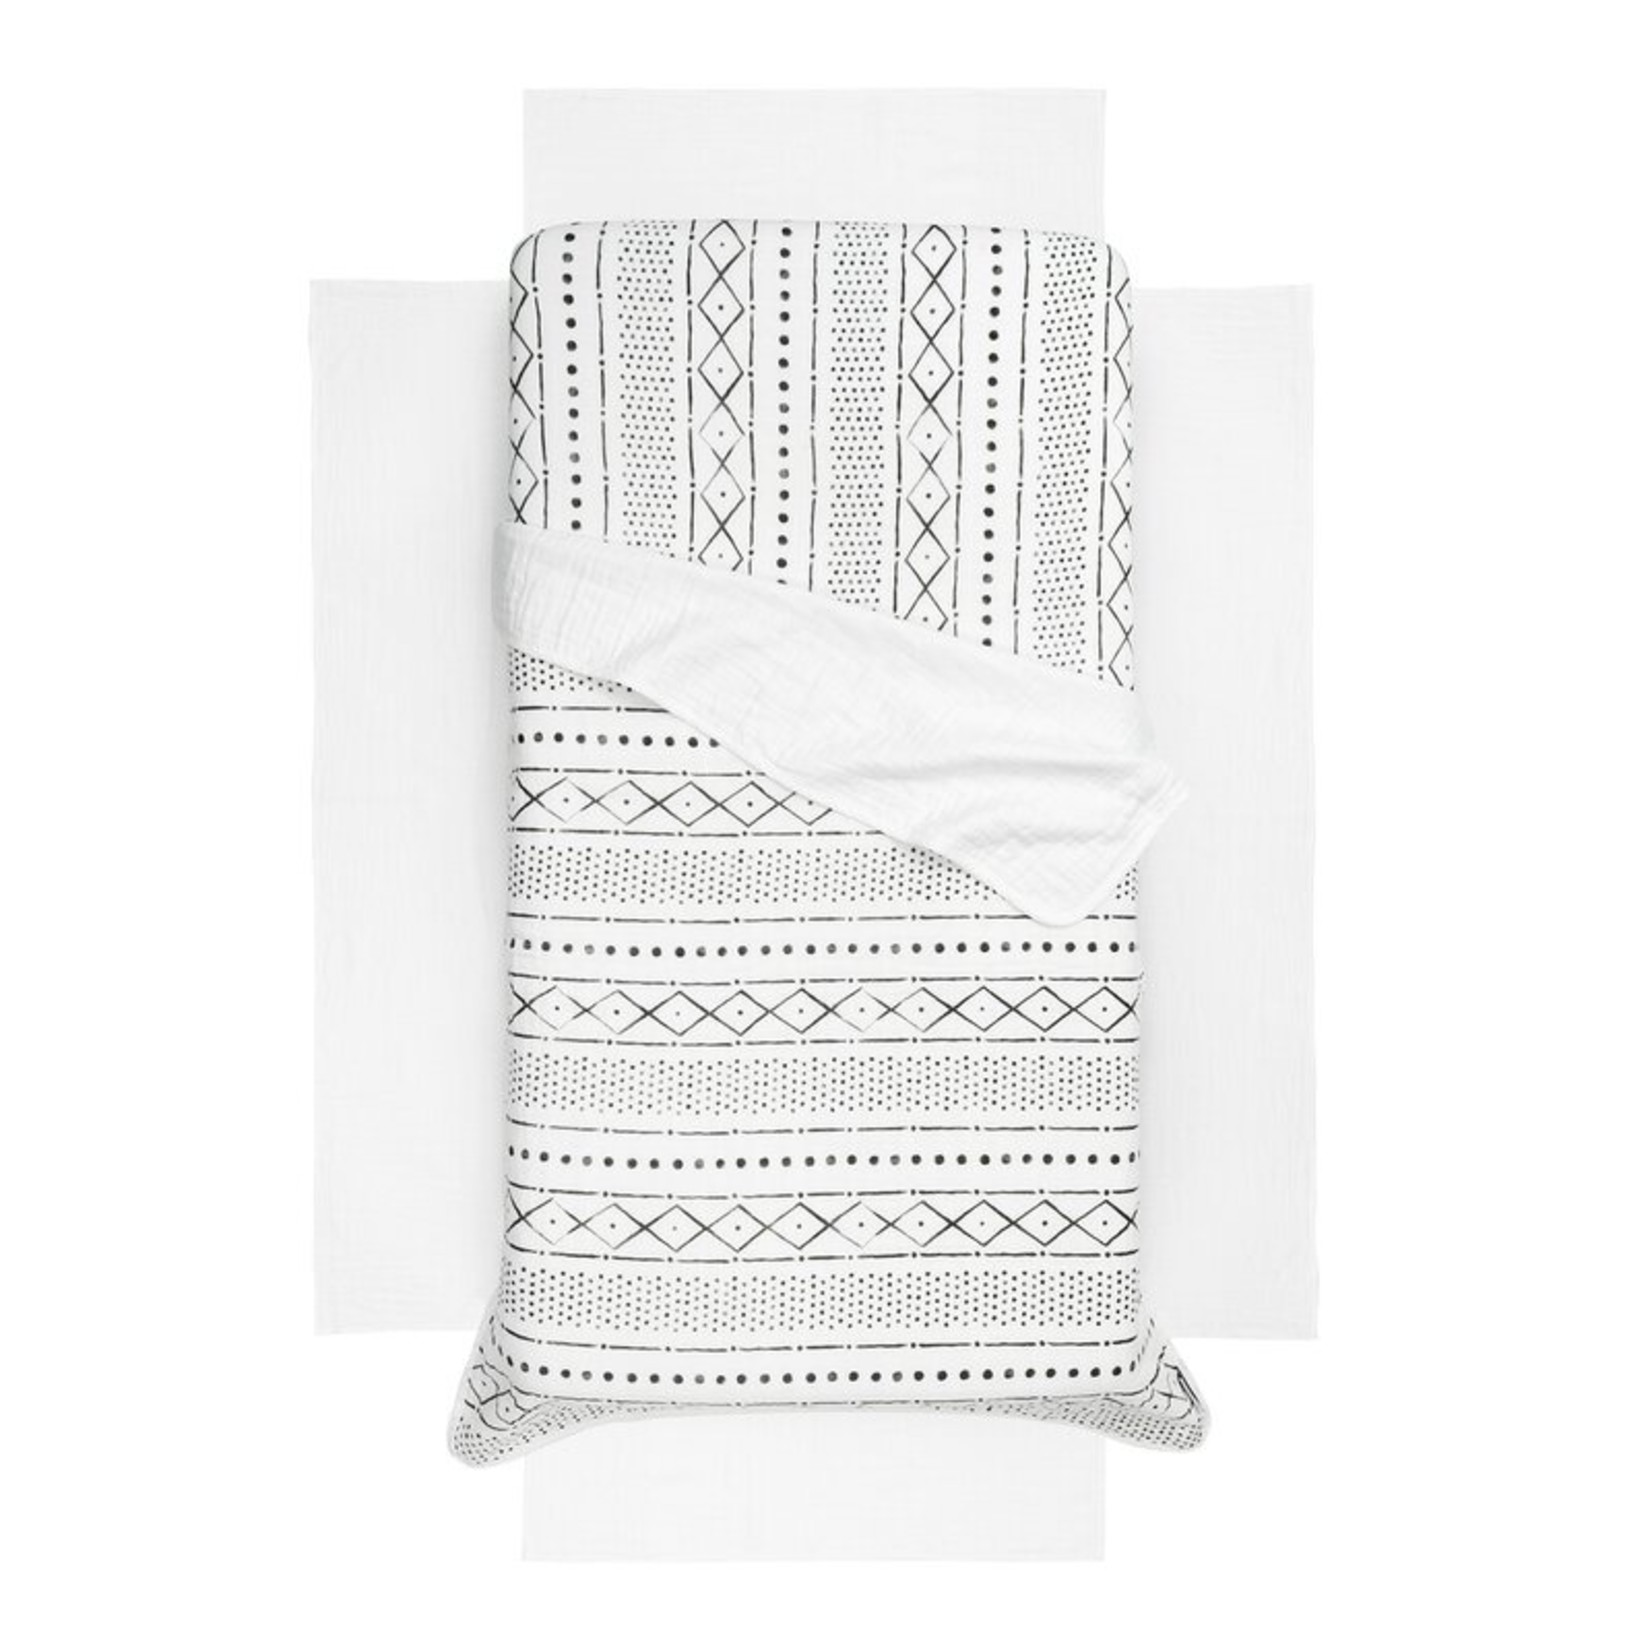 *Dreamit Muslin 3 Piece Crib Bedding Set - Final Sale